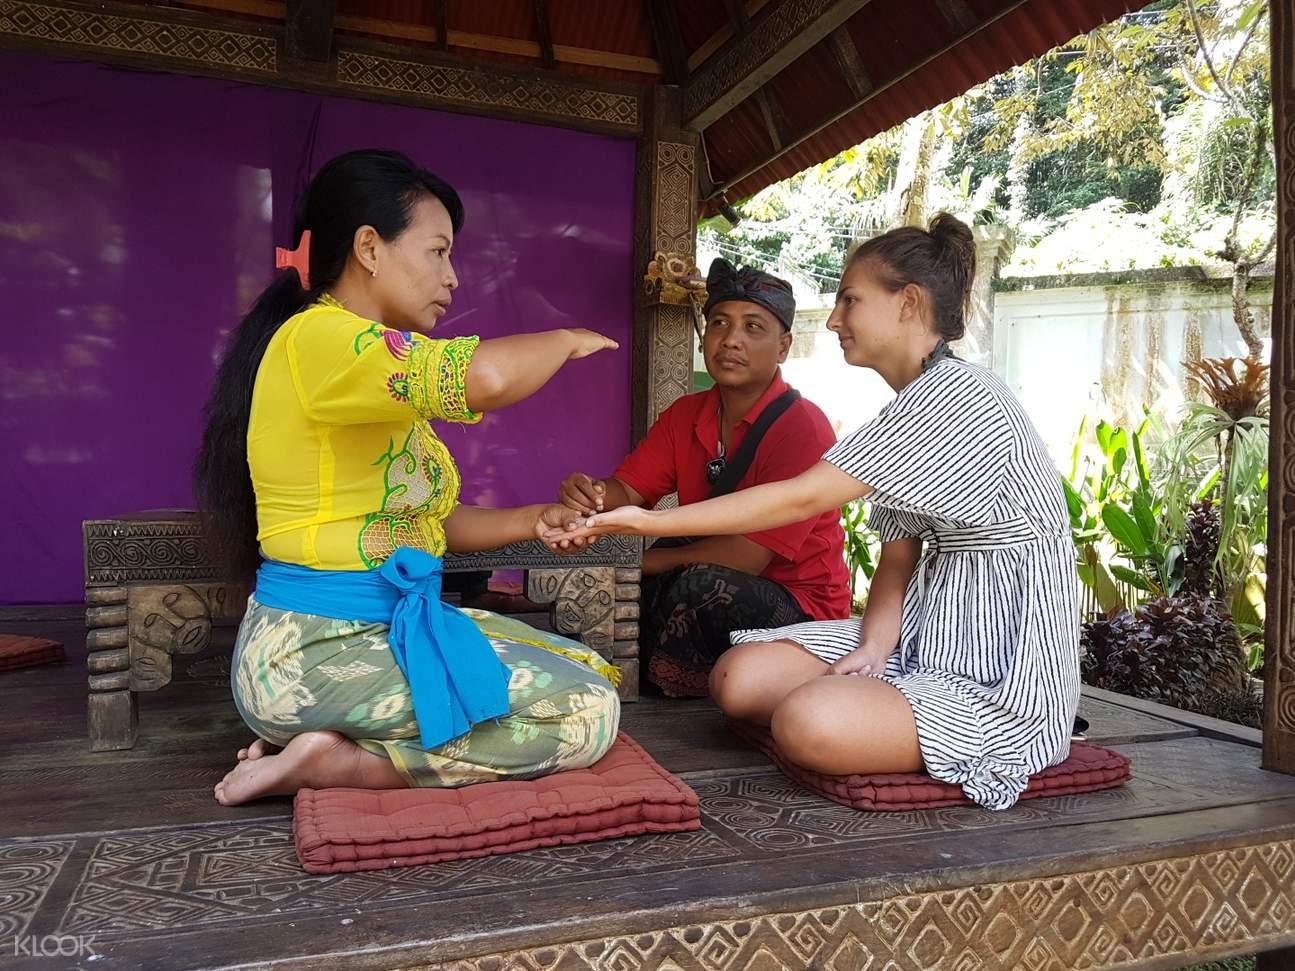 balinese healer performing palm reading